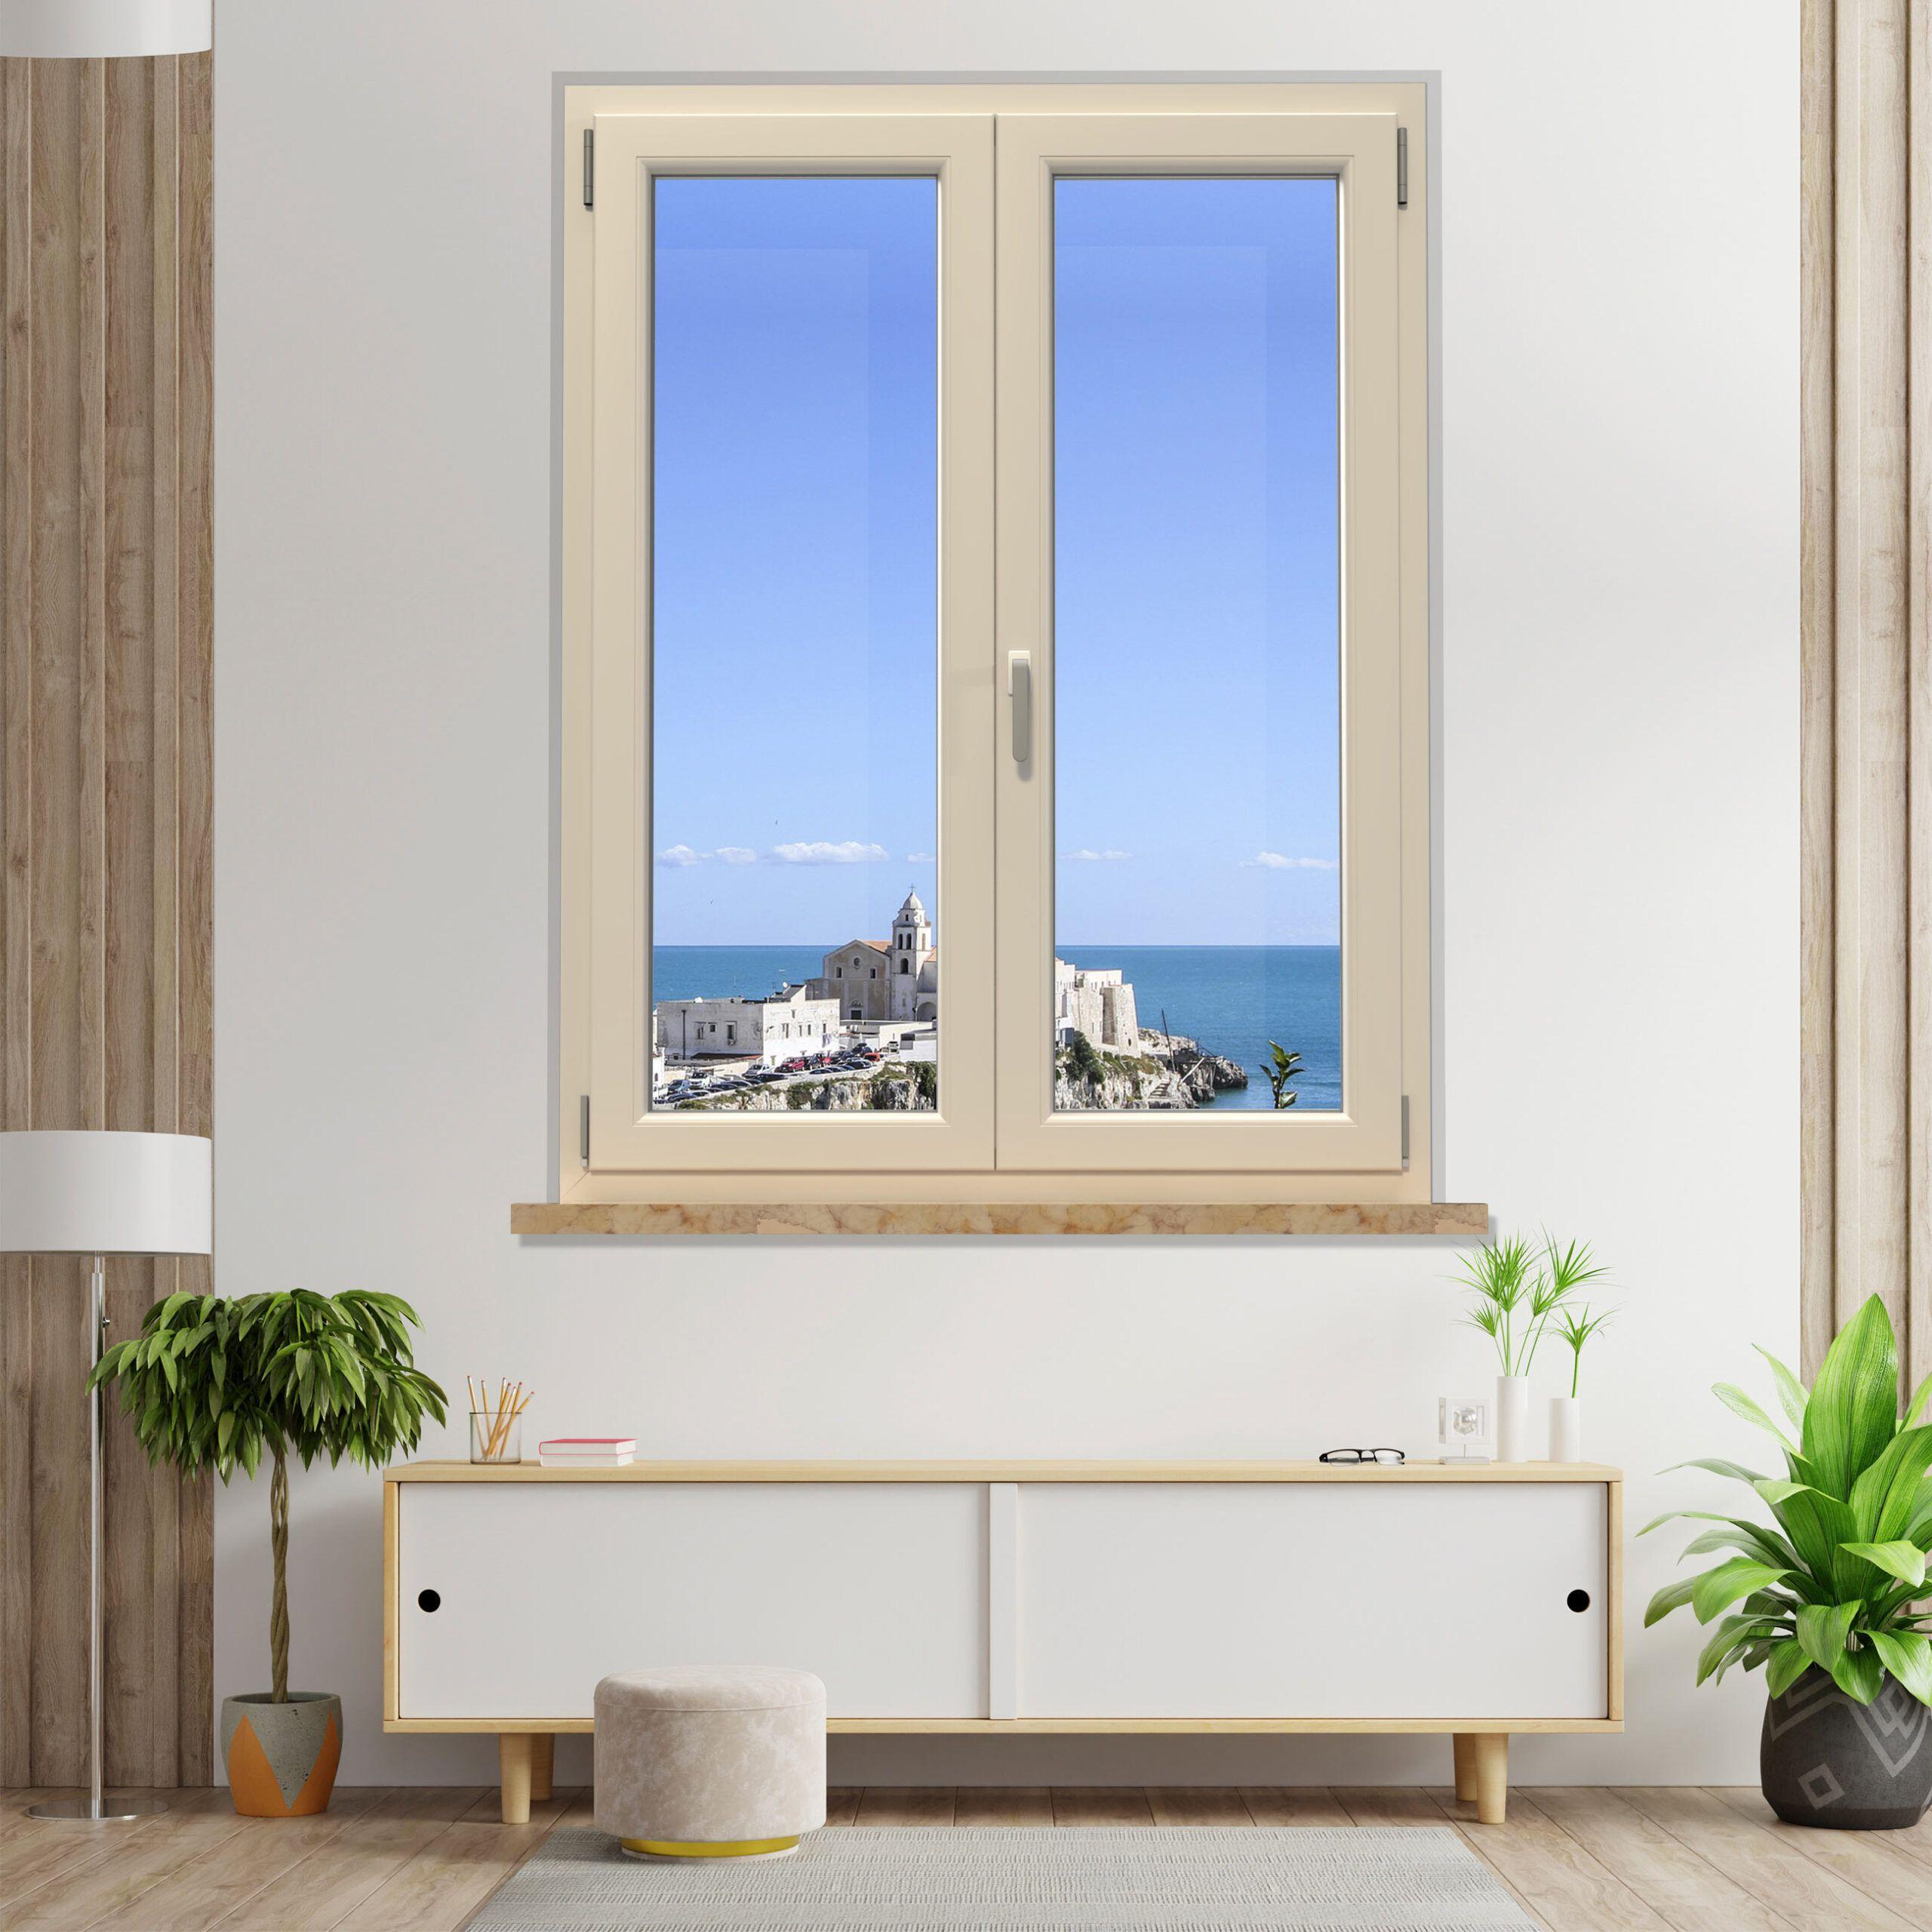 https://www.allpaint.it/wp-content/uploads/2021/06/finestre-ecoline-pvc-allpaint-scaled.jpg